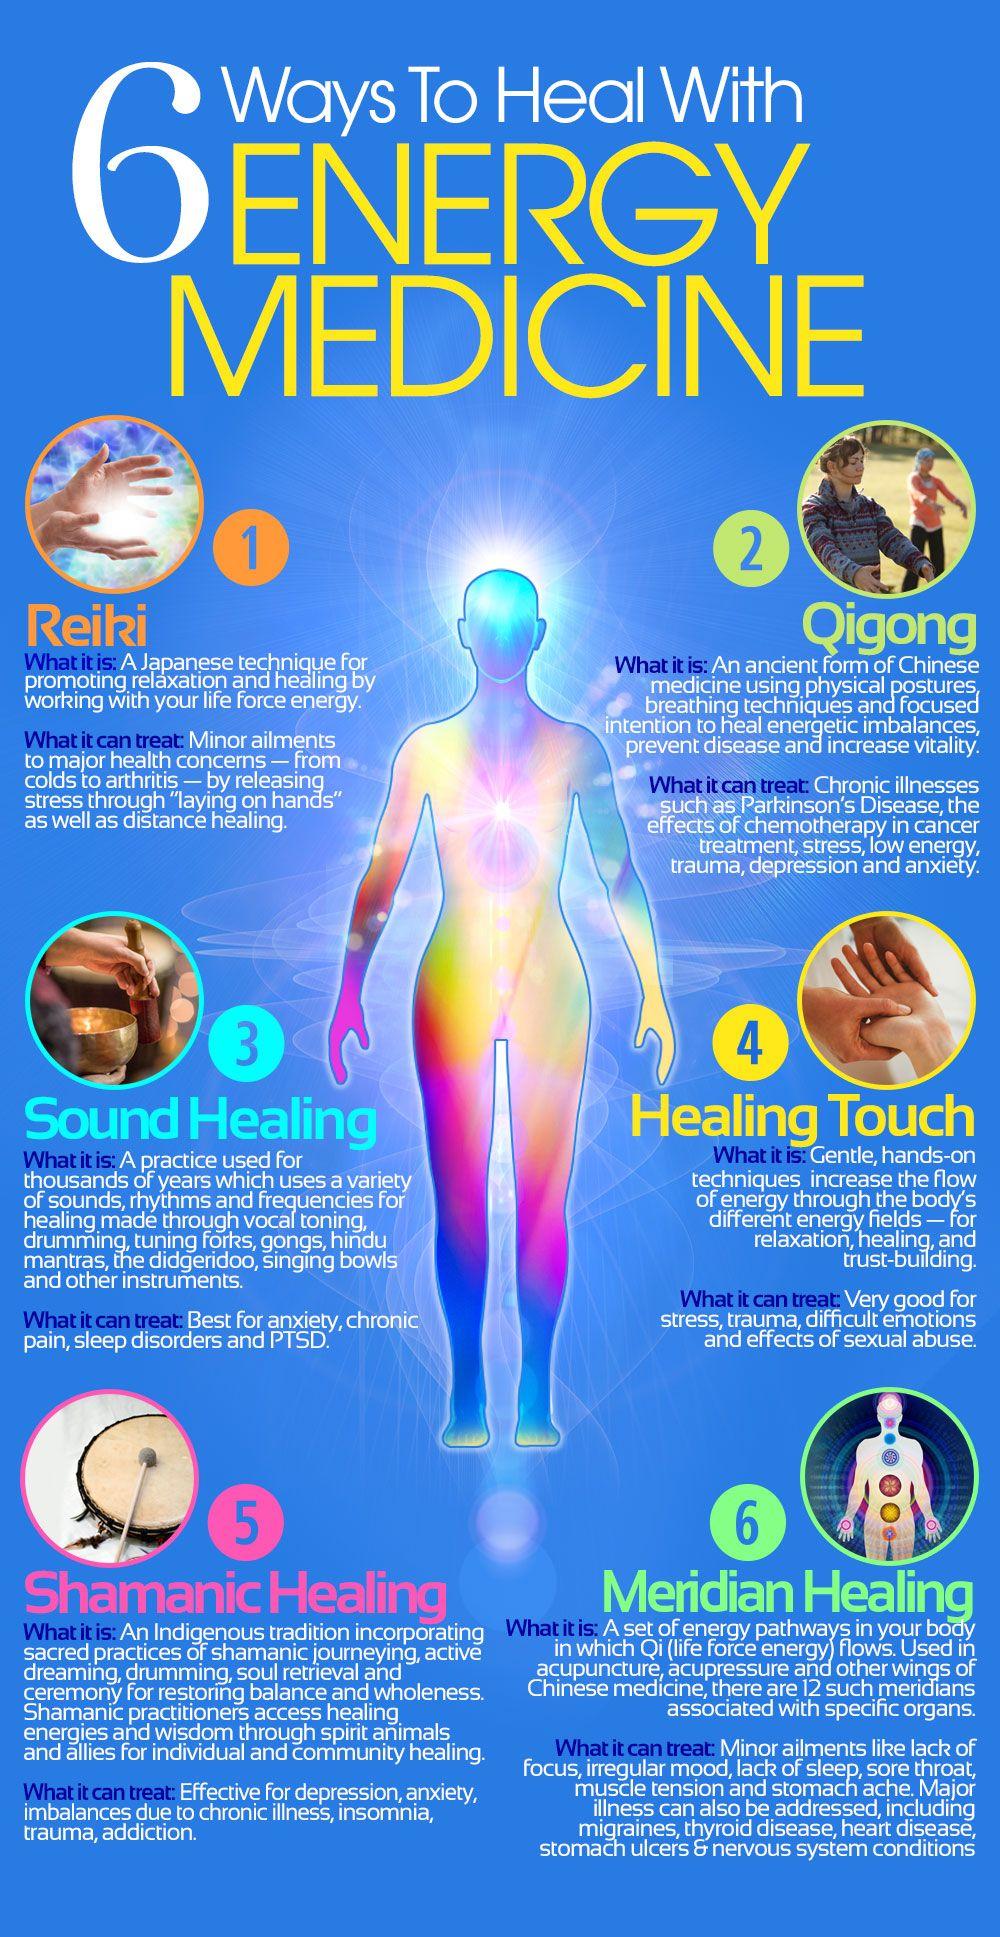 Pin by Ari's Momma on Yoga | Pinterest | Healing, Reiki and Reiki healer